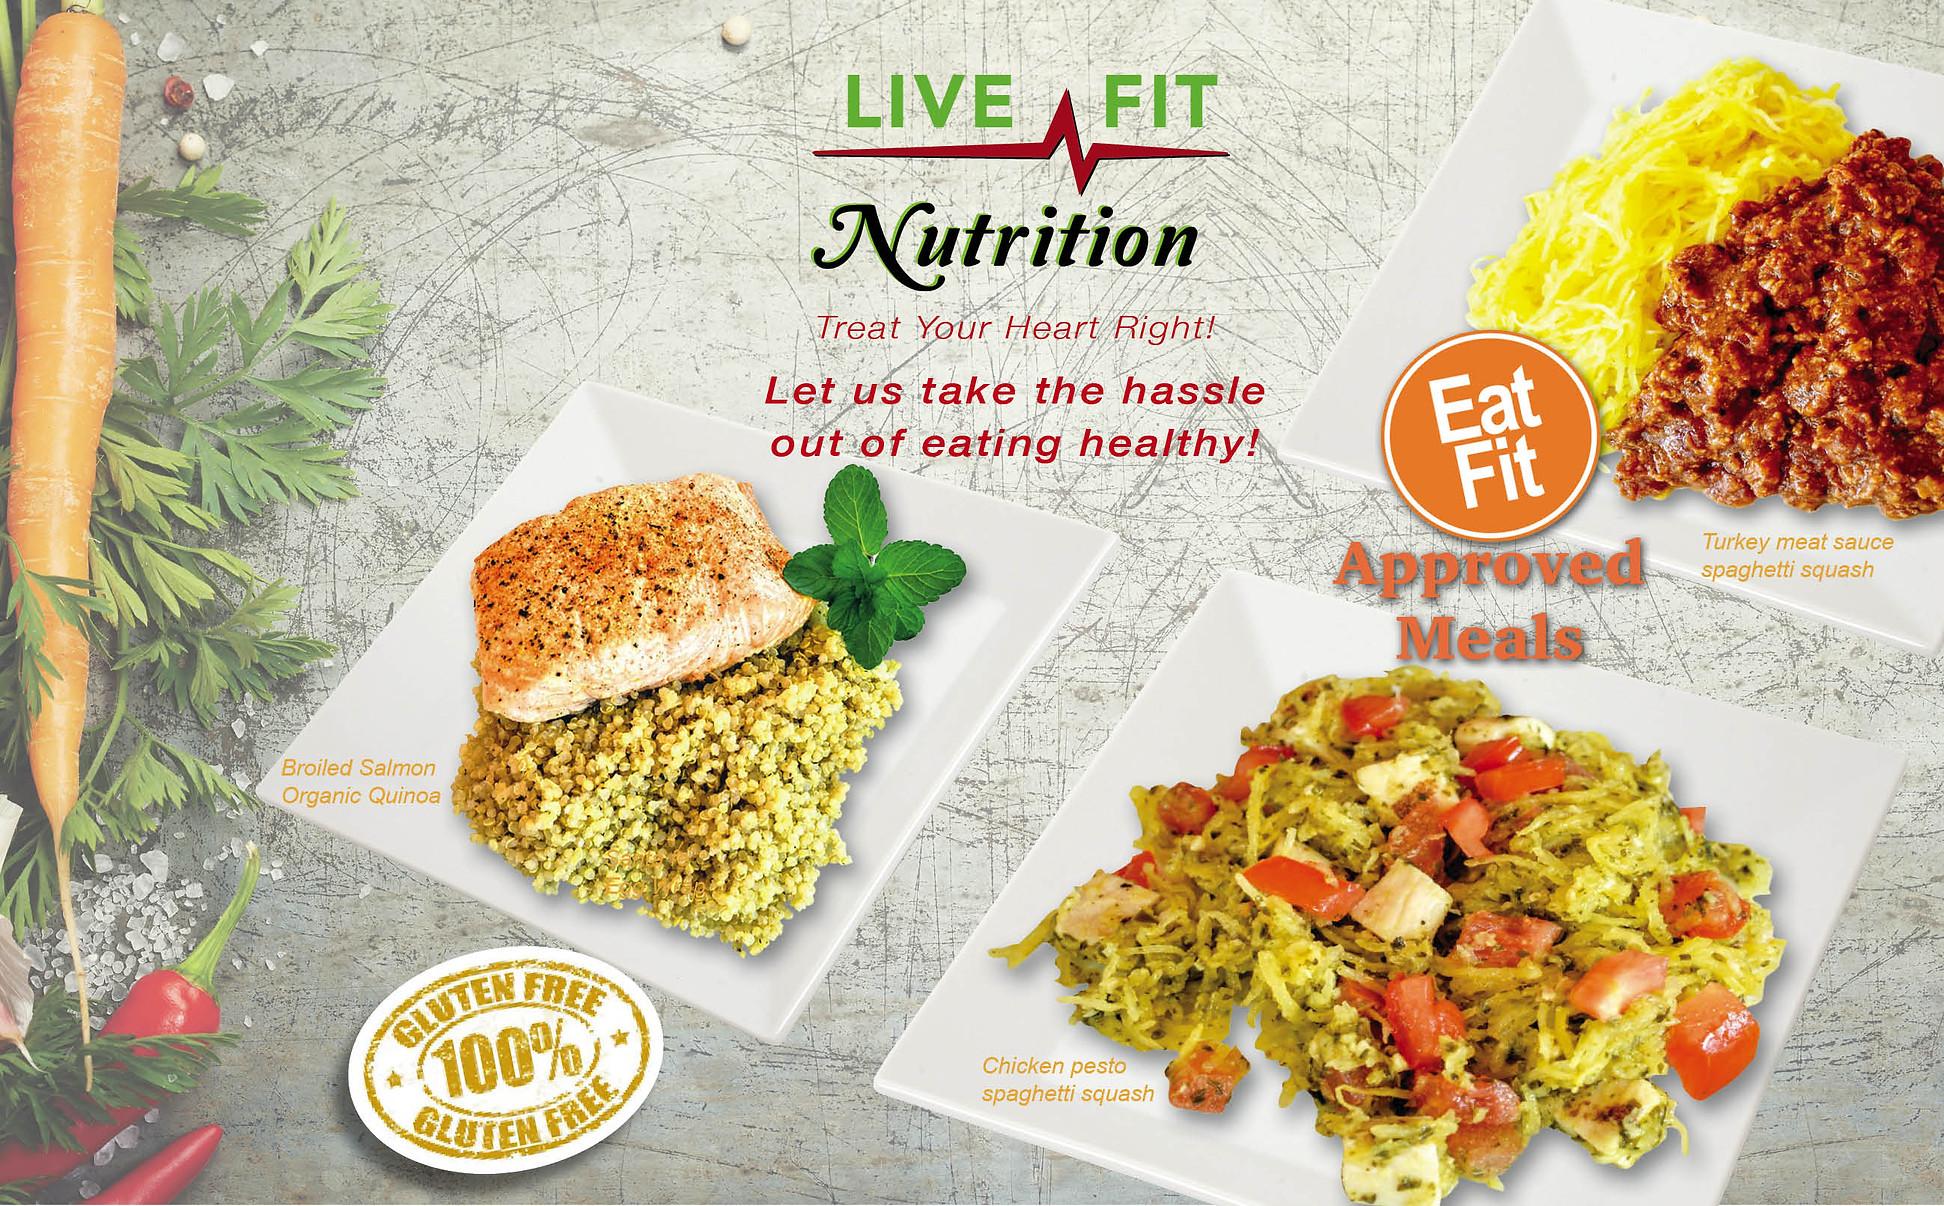 Gluten free meals, Health food, prepared meals